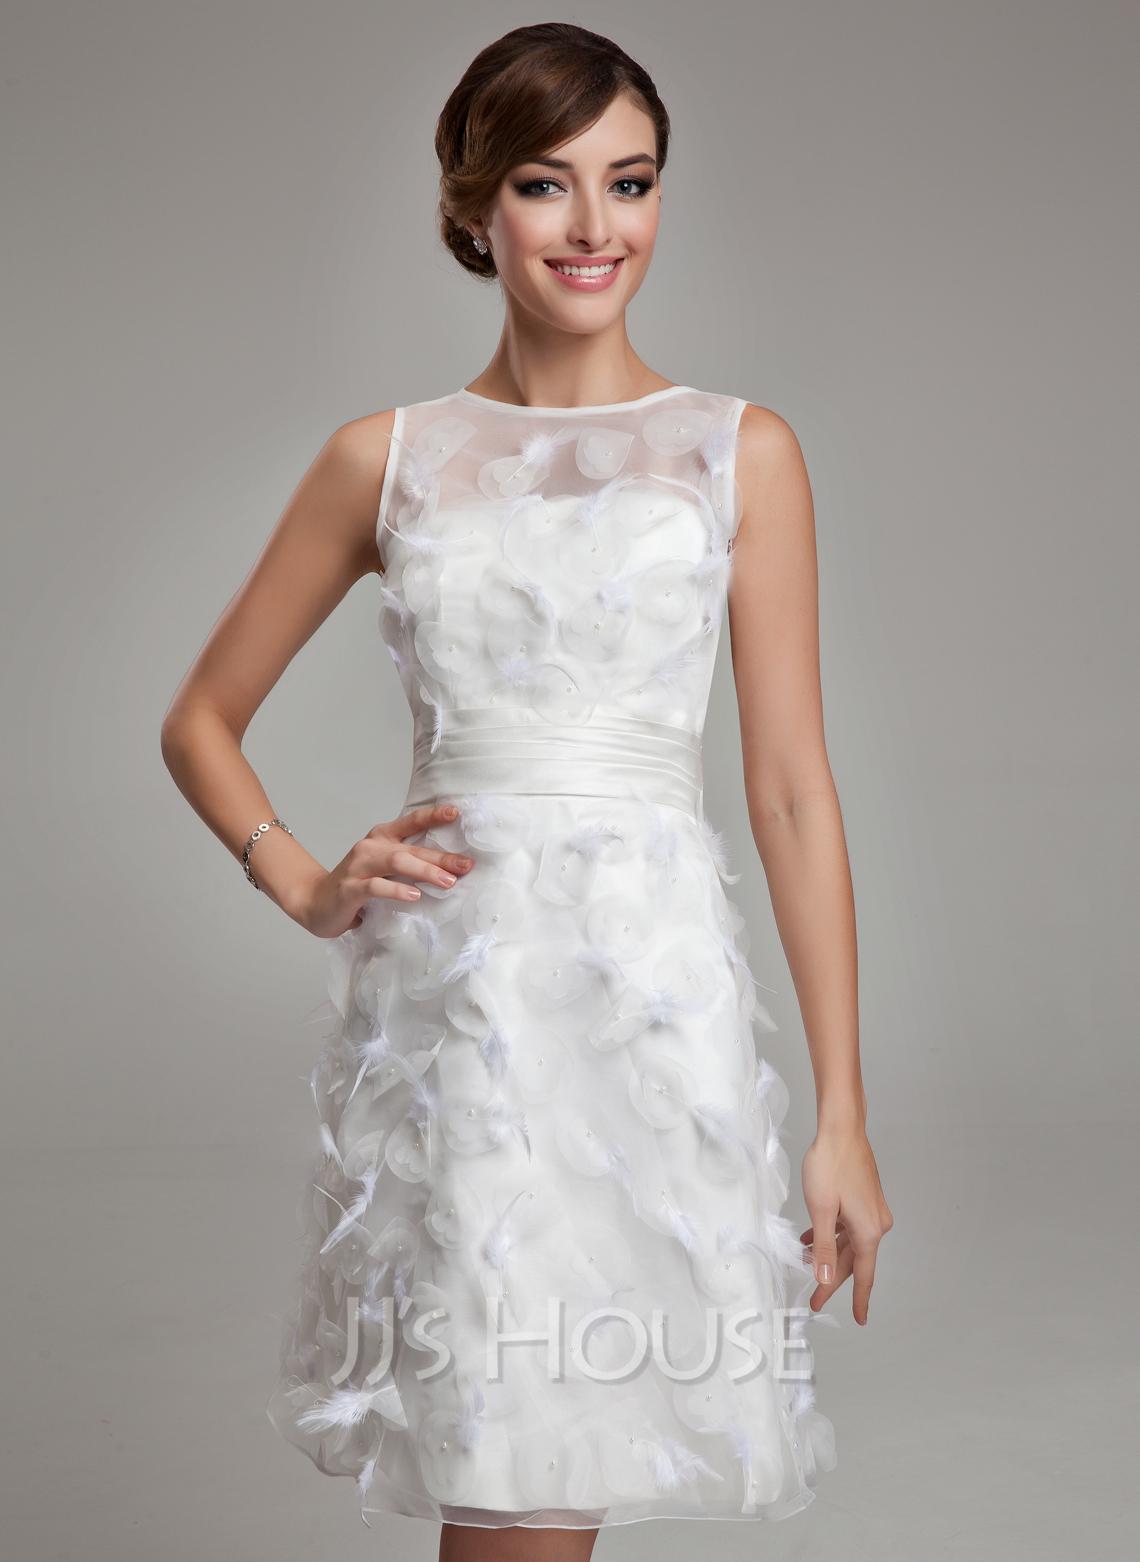 sheath column scoop neck knee length satin organza wedding dress with feather 002011489 jjshouse. Black Bedroom Furniture Sets. Home Design Ideas